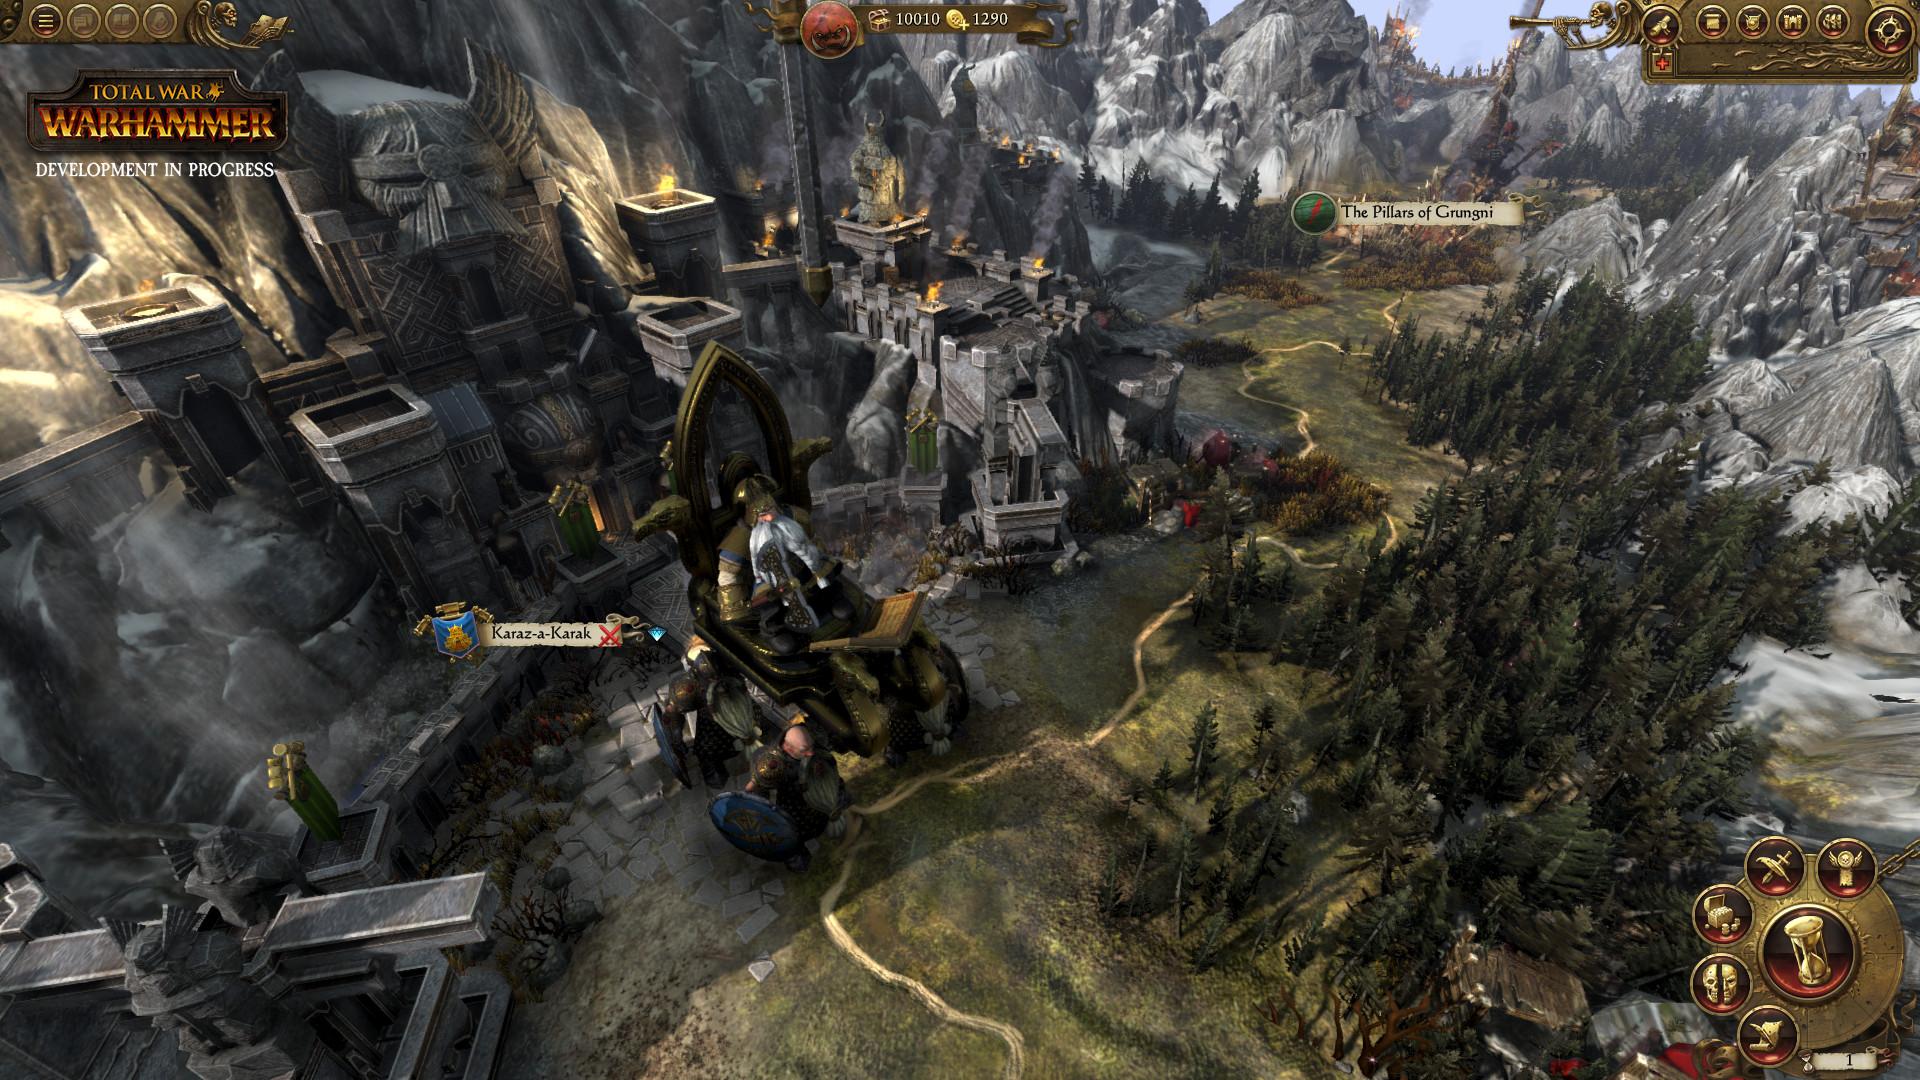 Total War: Warhammer Screenshot 2